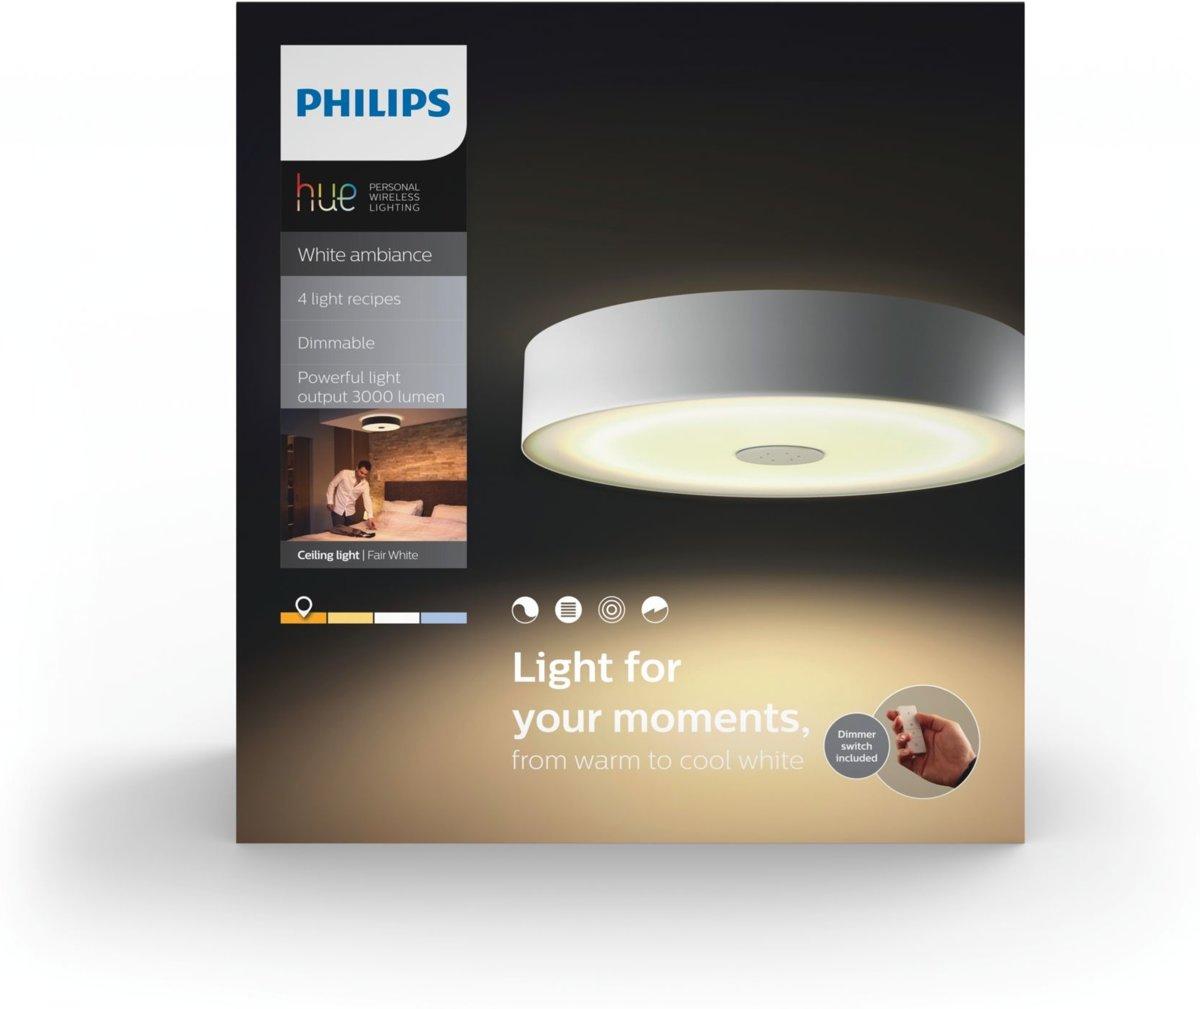 Koud Wit Licht : Bol.com philips hue fair white ambiance plafondlamp incl dim